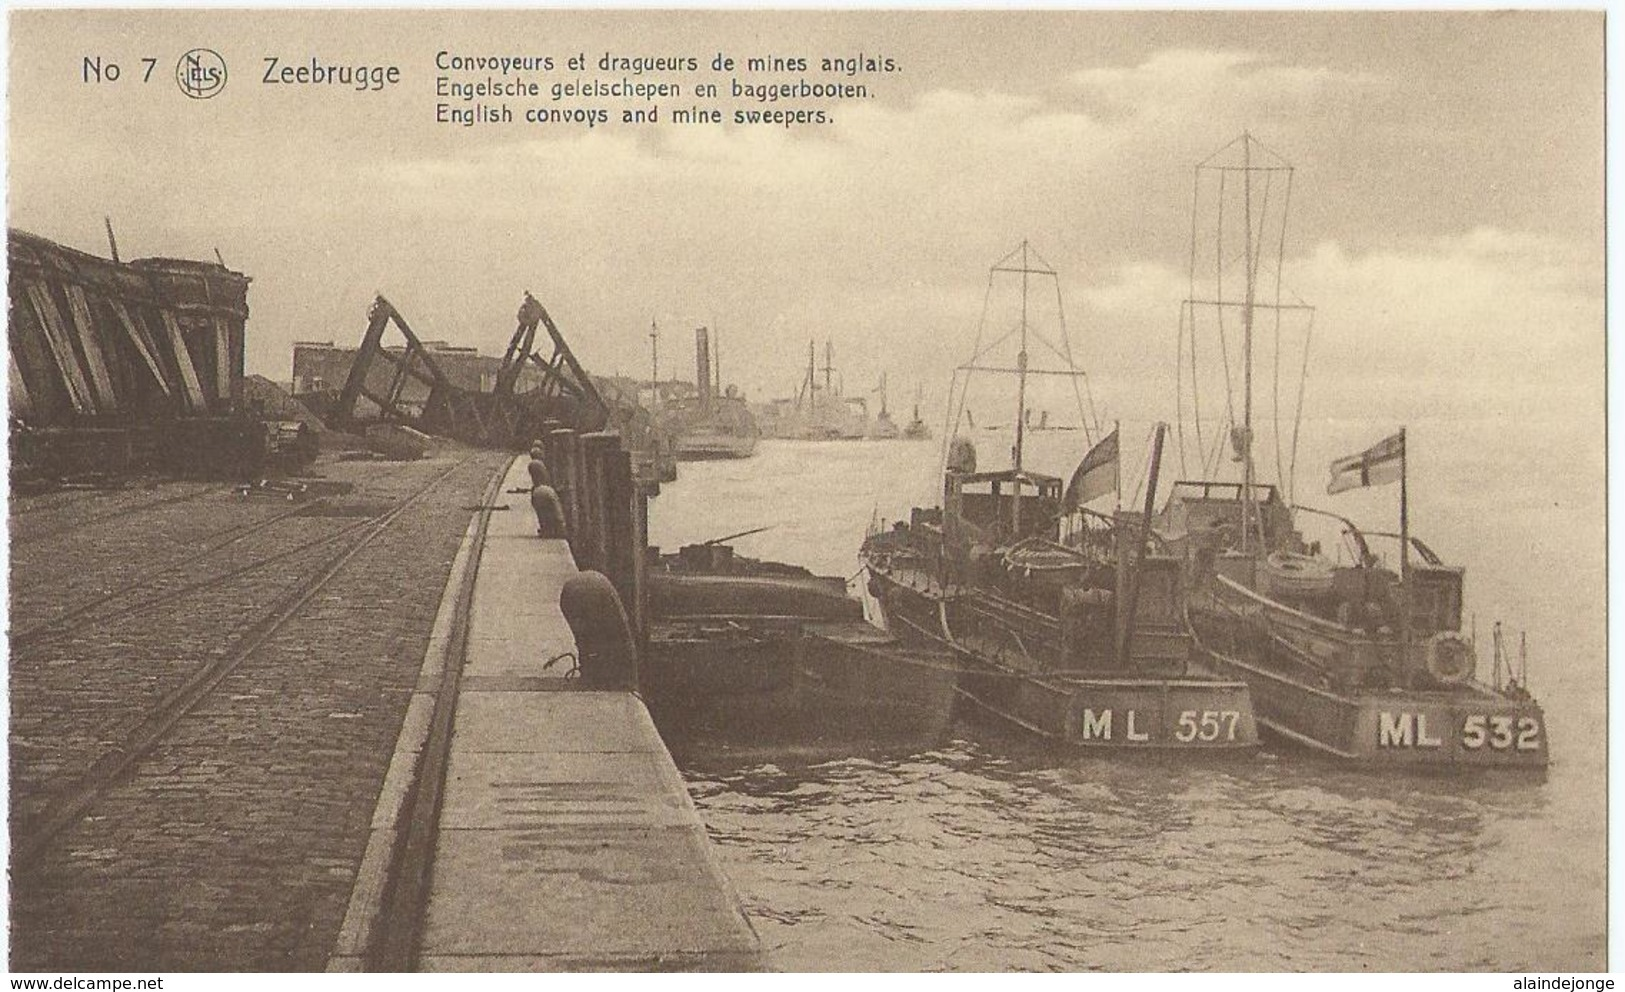 Zeebrugge - No 7 - Convoyeurs Et Drageurs De Mines Anglais - English Convoys And Mine Sweepers - Zeebrugge